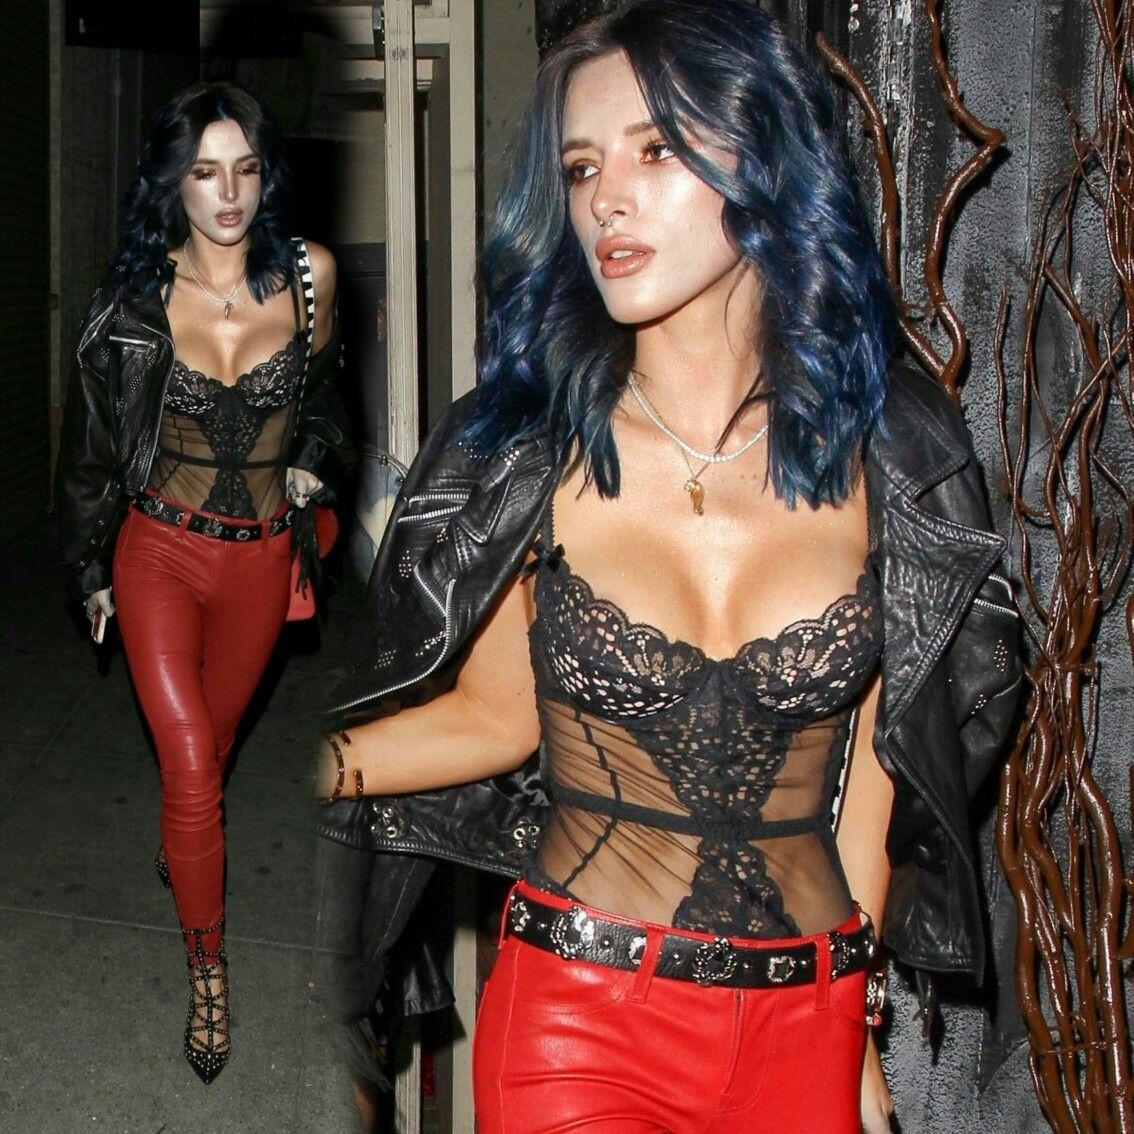 #BellaThorne debuting her new blue hair last night in downtown Los Angeles! • • • • • • • • • • • • • • • • • • • • • • • • • • • • • • #BellaThorne estréiando seu novo hair azul ontem à noite no centro de Los Ángeles!